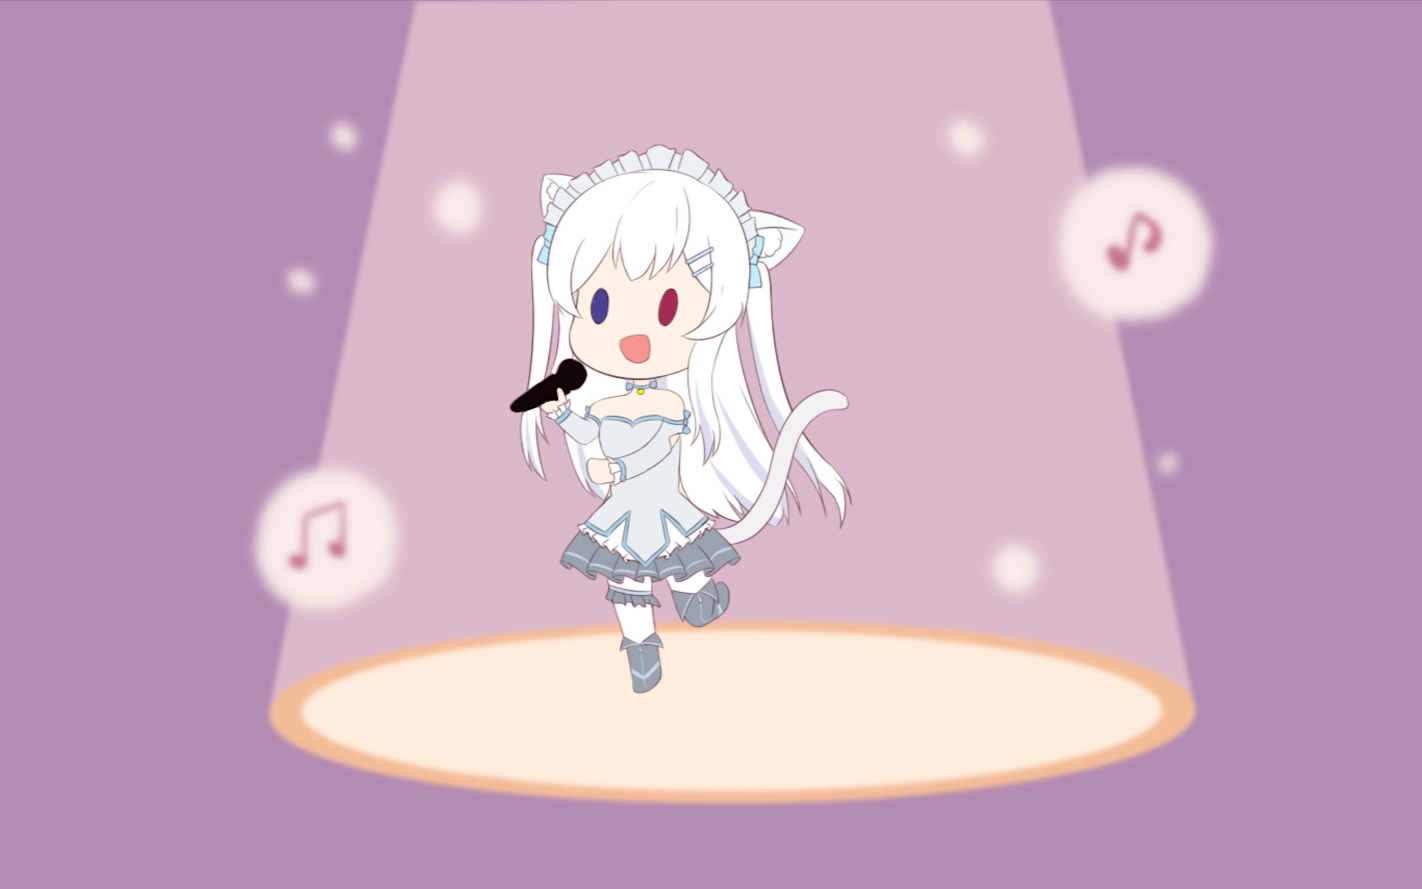 【描改手书】wafu(>ω<)wafu(>ω<)wafu(>ω<)-!雪喵酱!!!